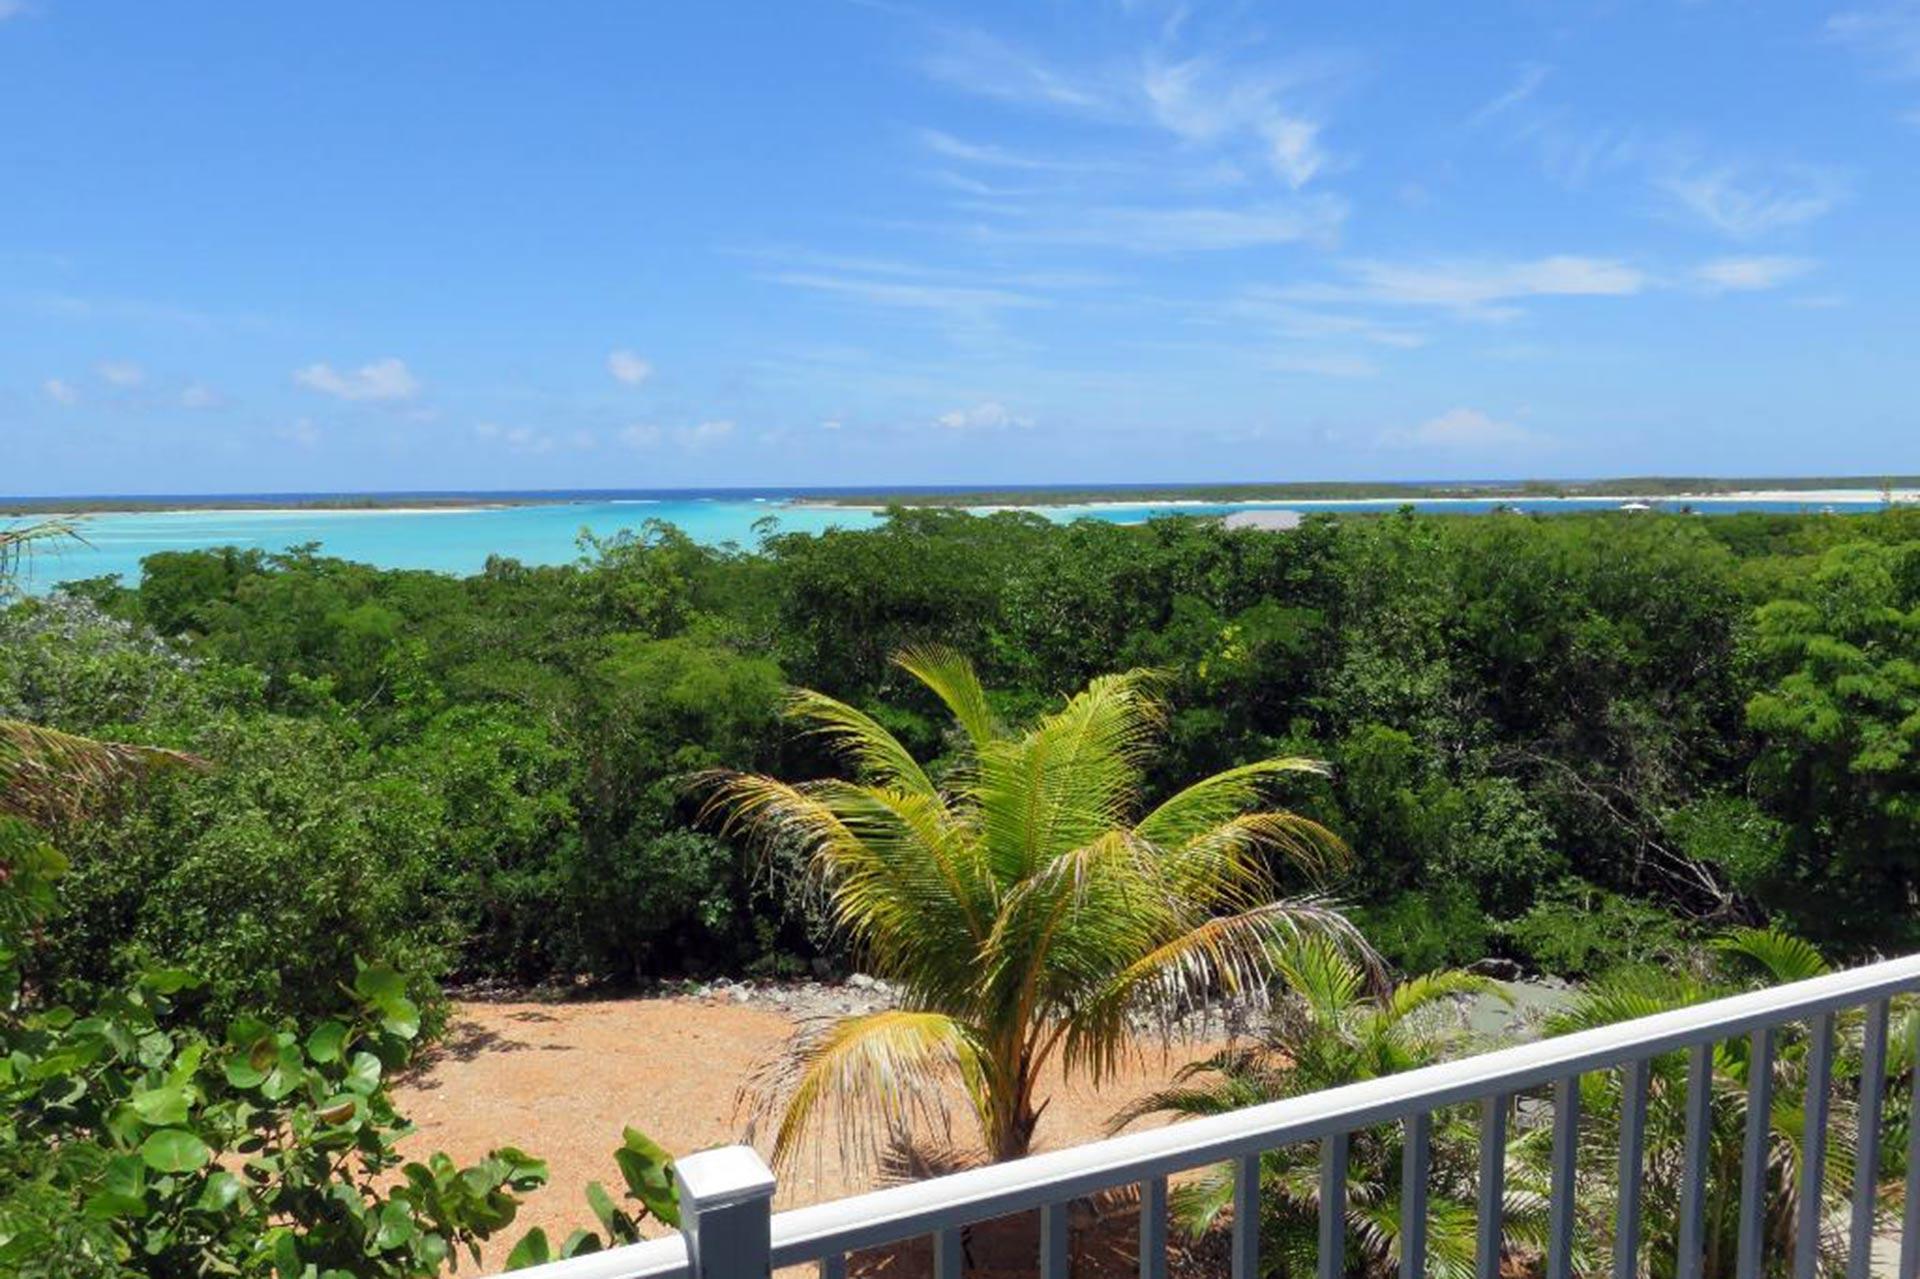 Harbor Breeze Villas in the Bahamas